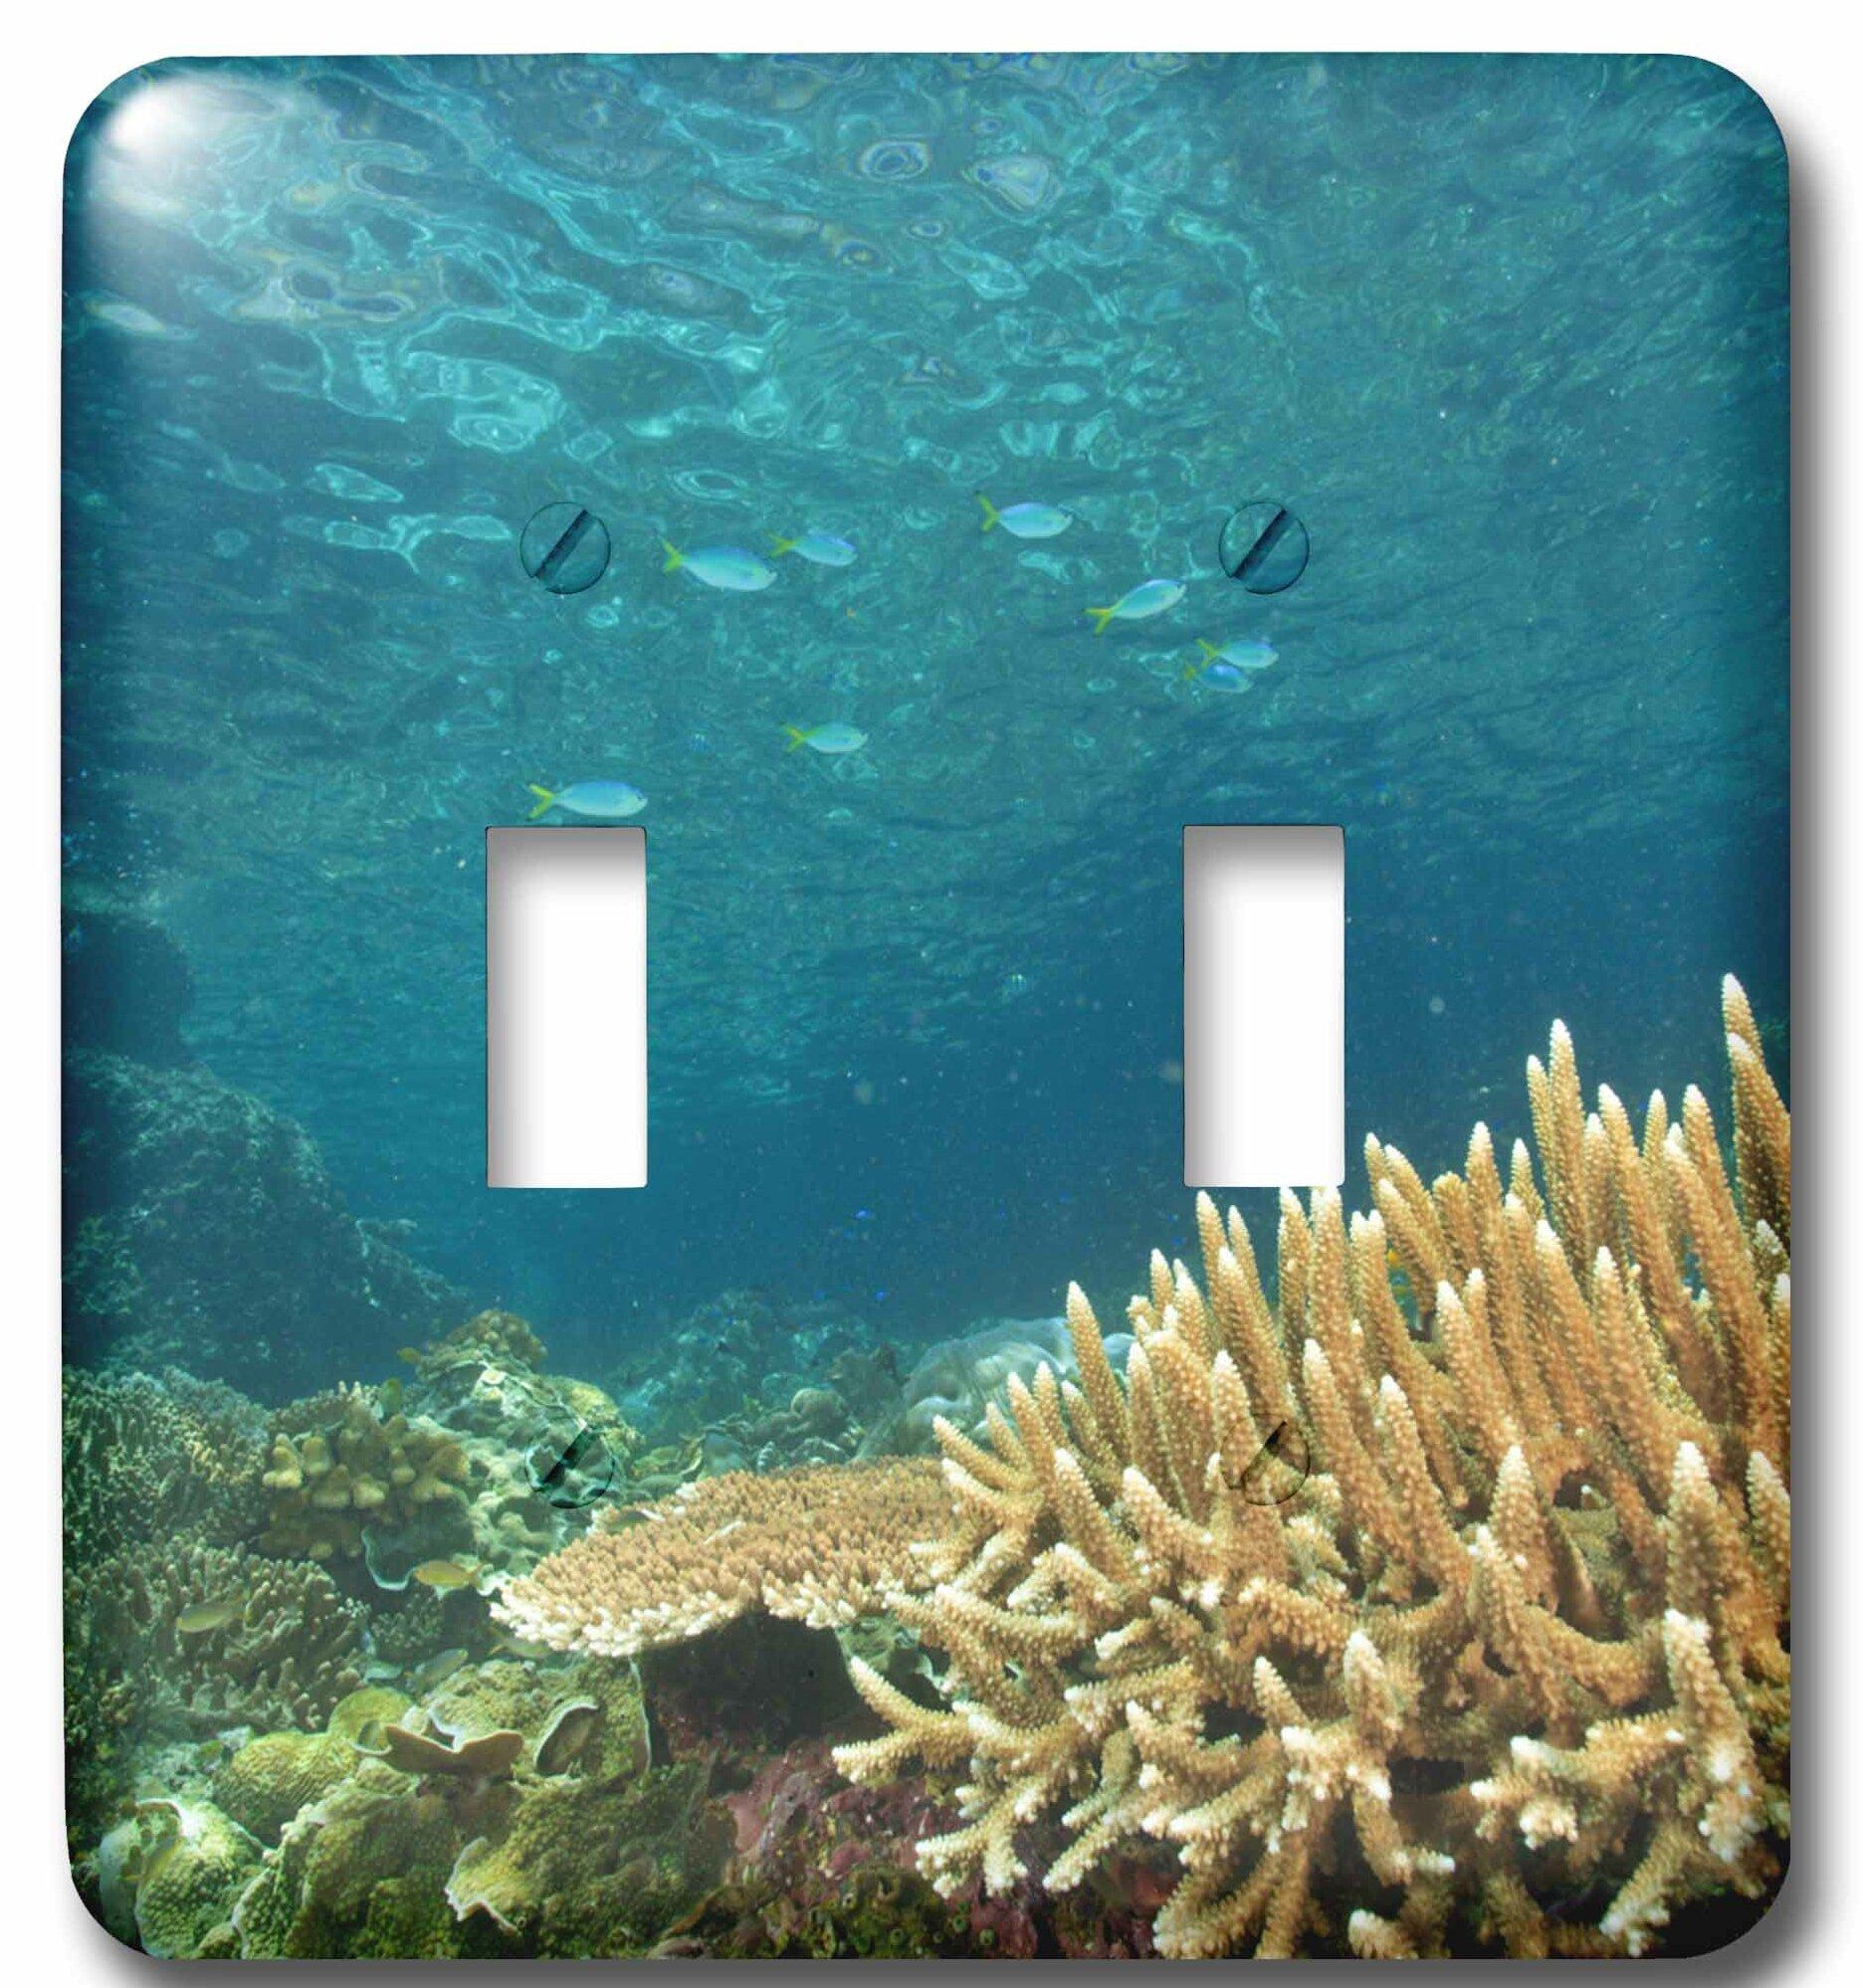 3drose Reef Fusilier Fish Raja Ampat Papua 2 Gang Toggle Light Switch Wall Plate Wayfair